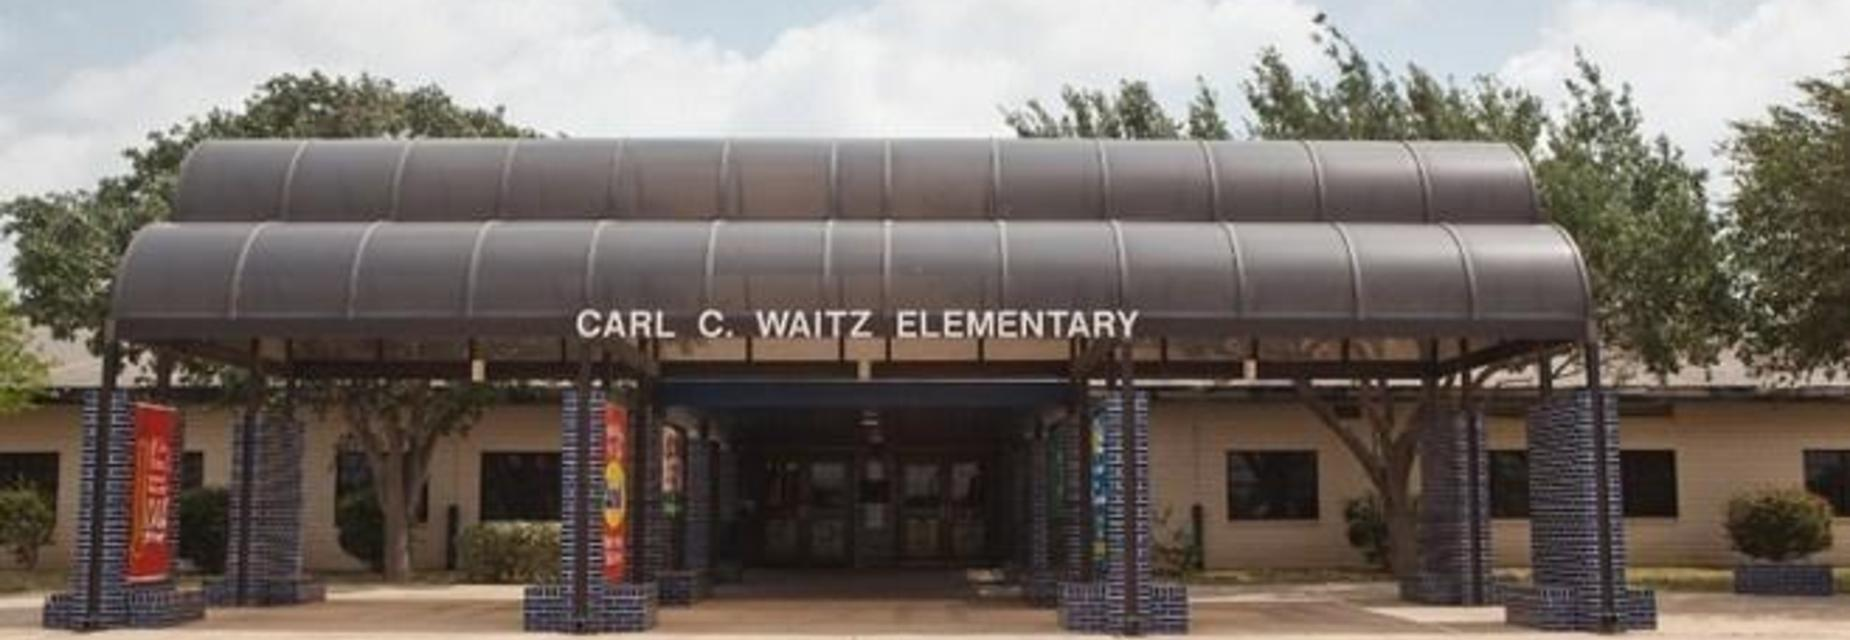 Waitz Elementary School